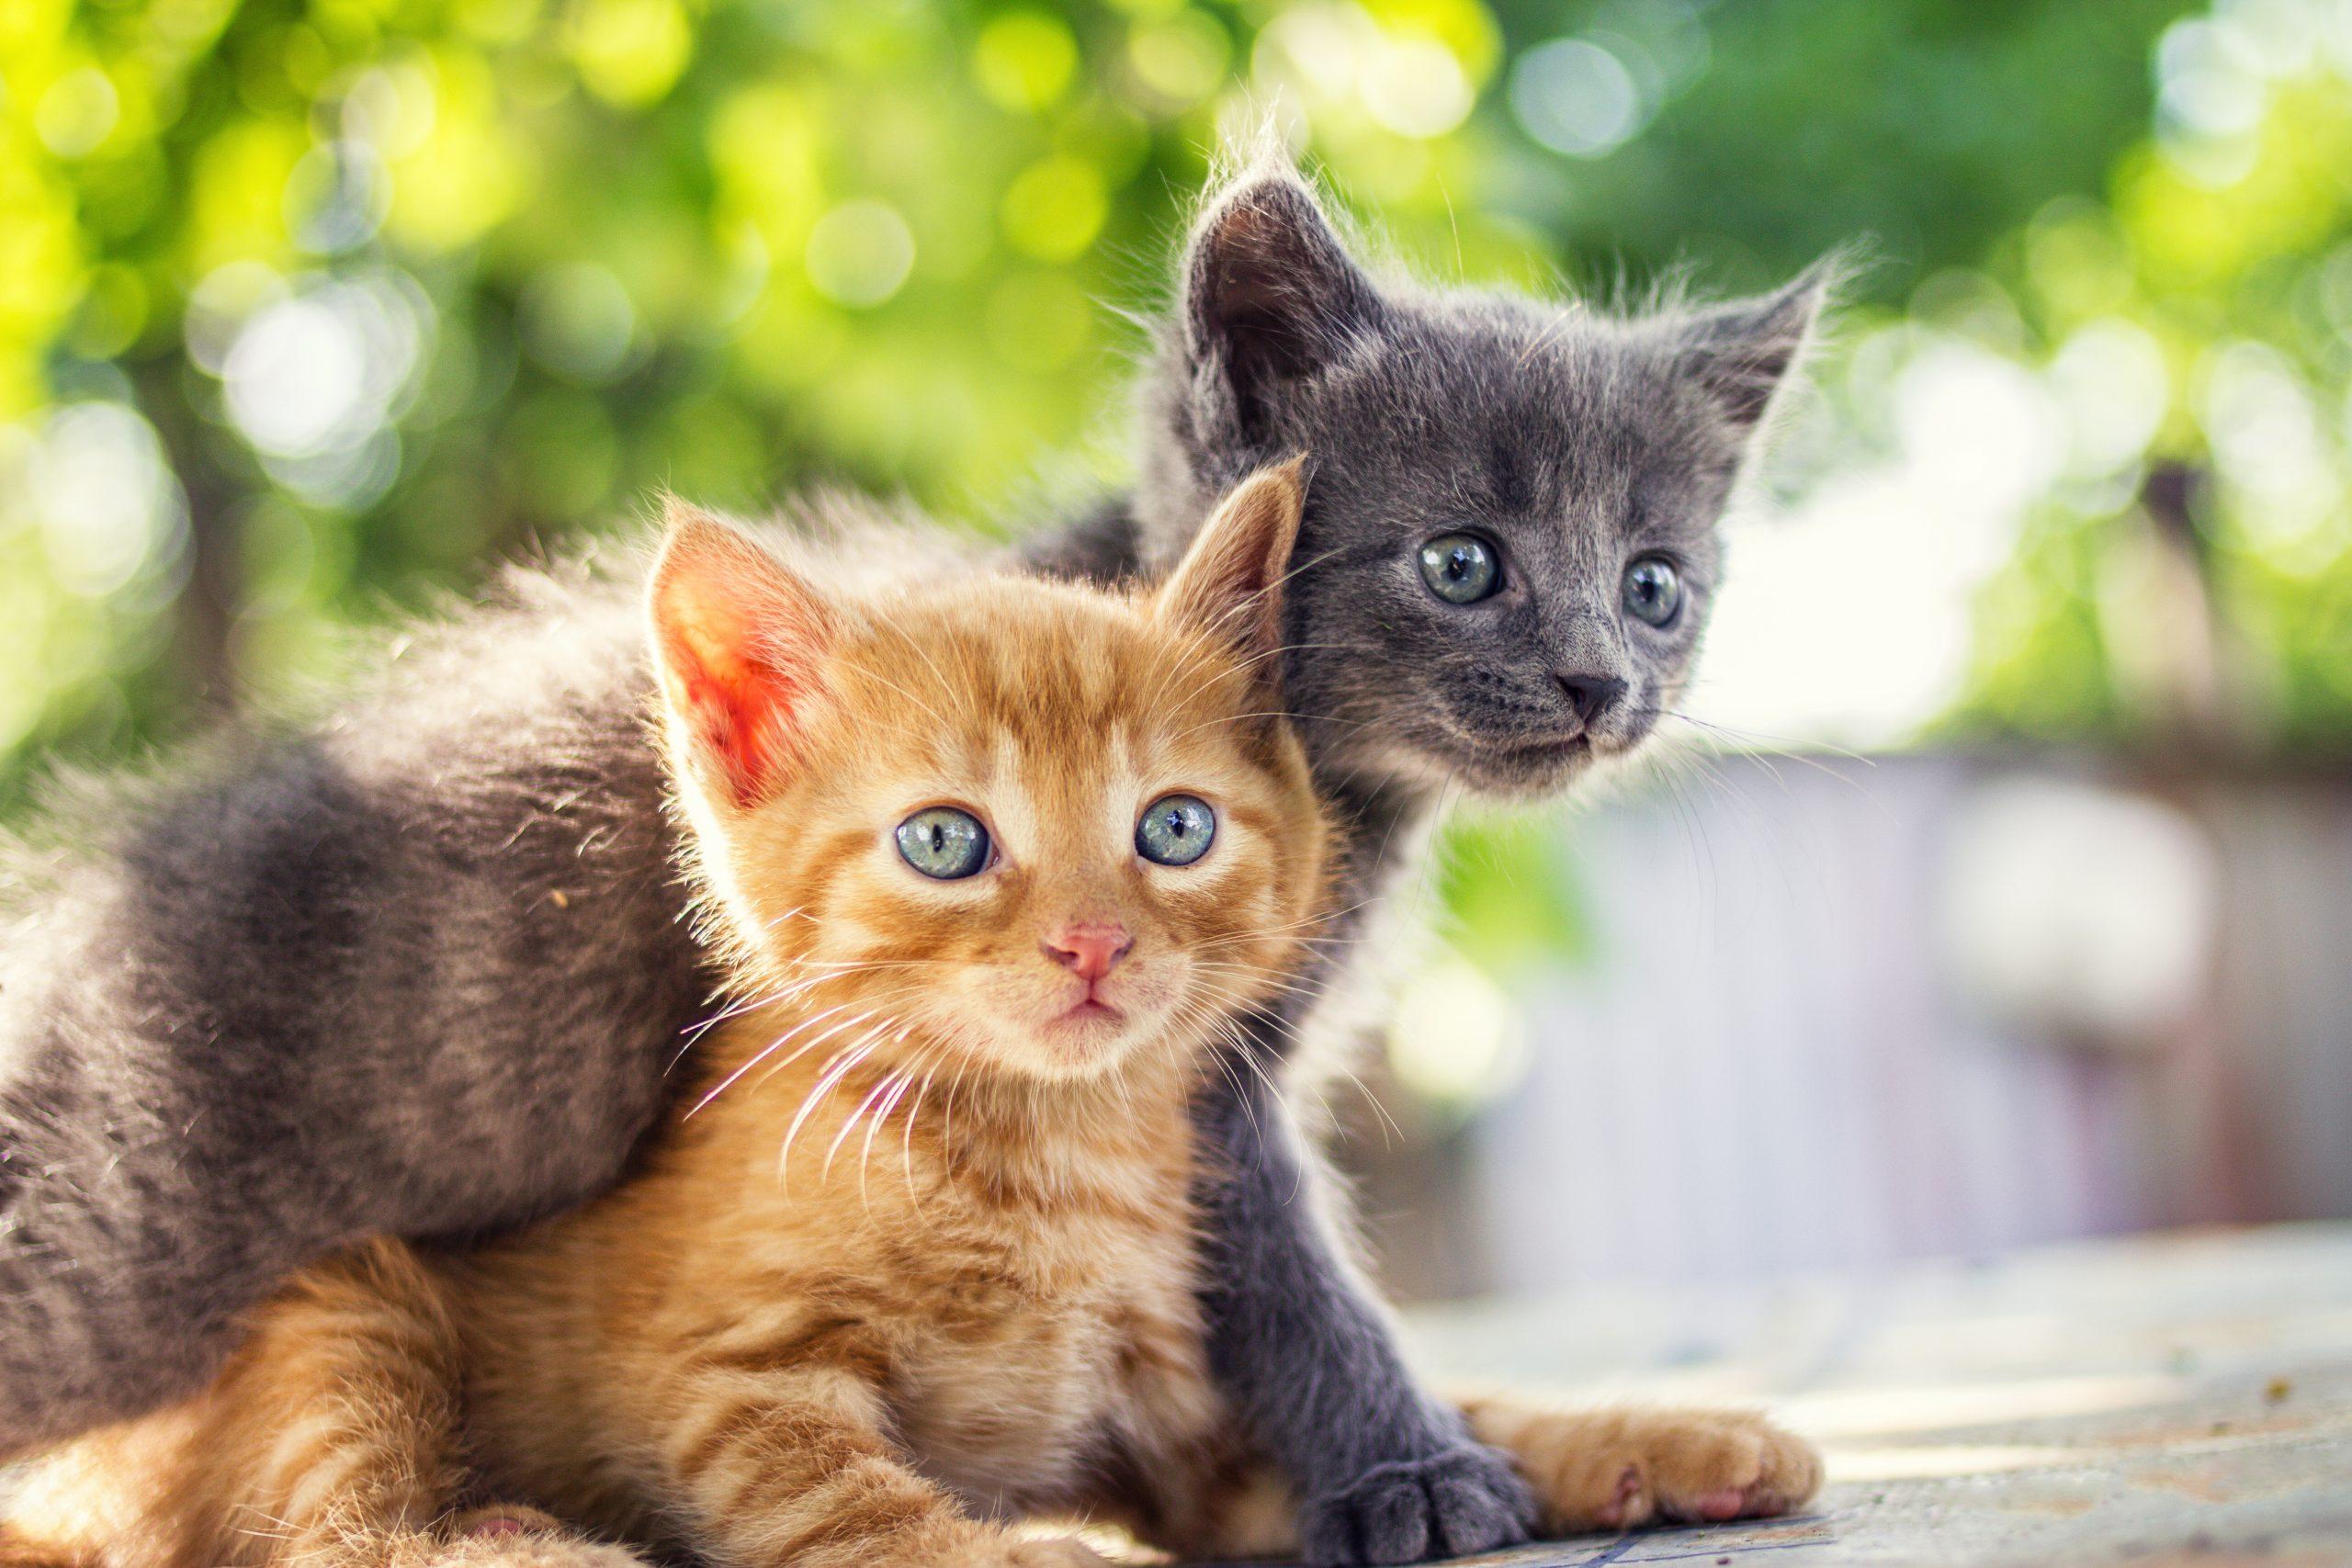 Caring For Your New Kitten Bob Martin